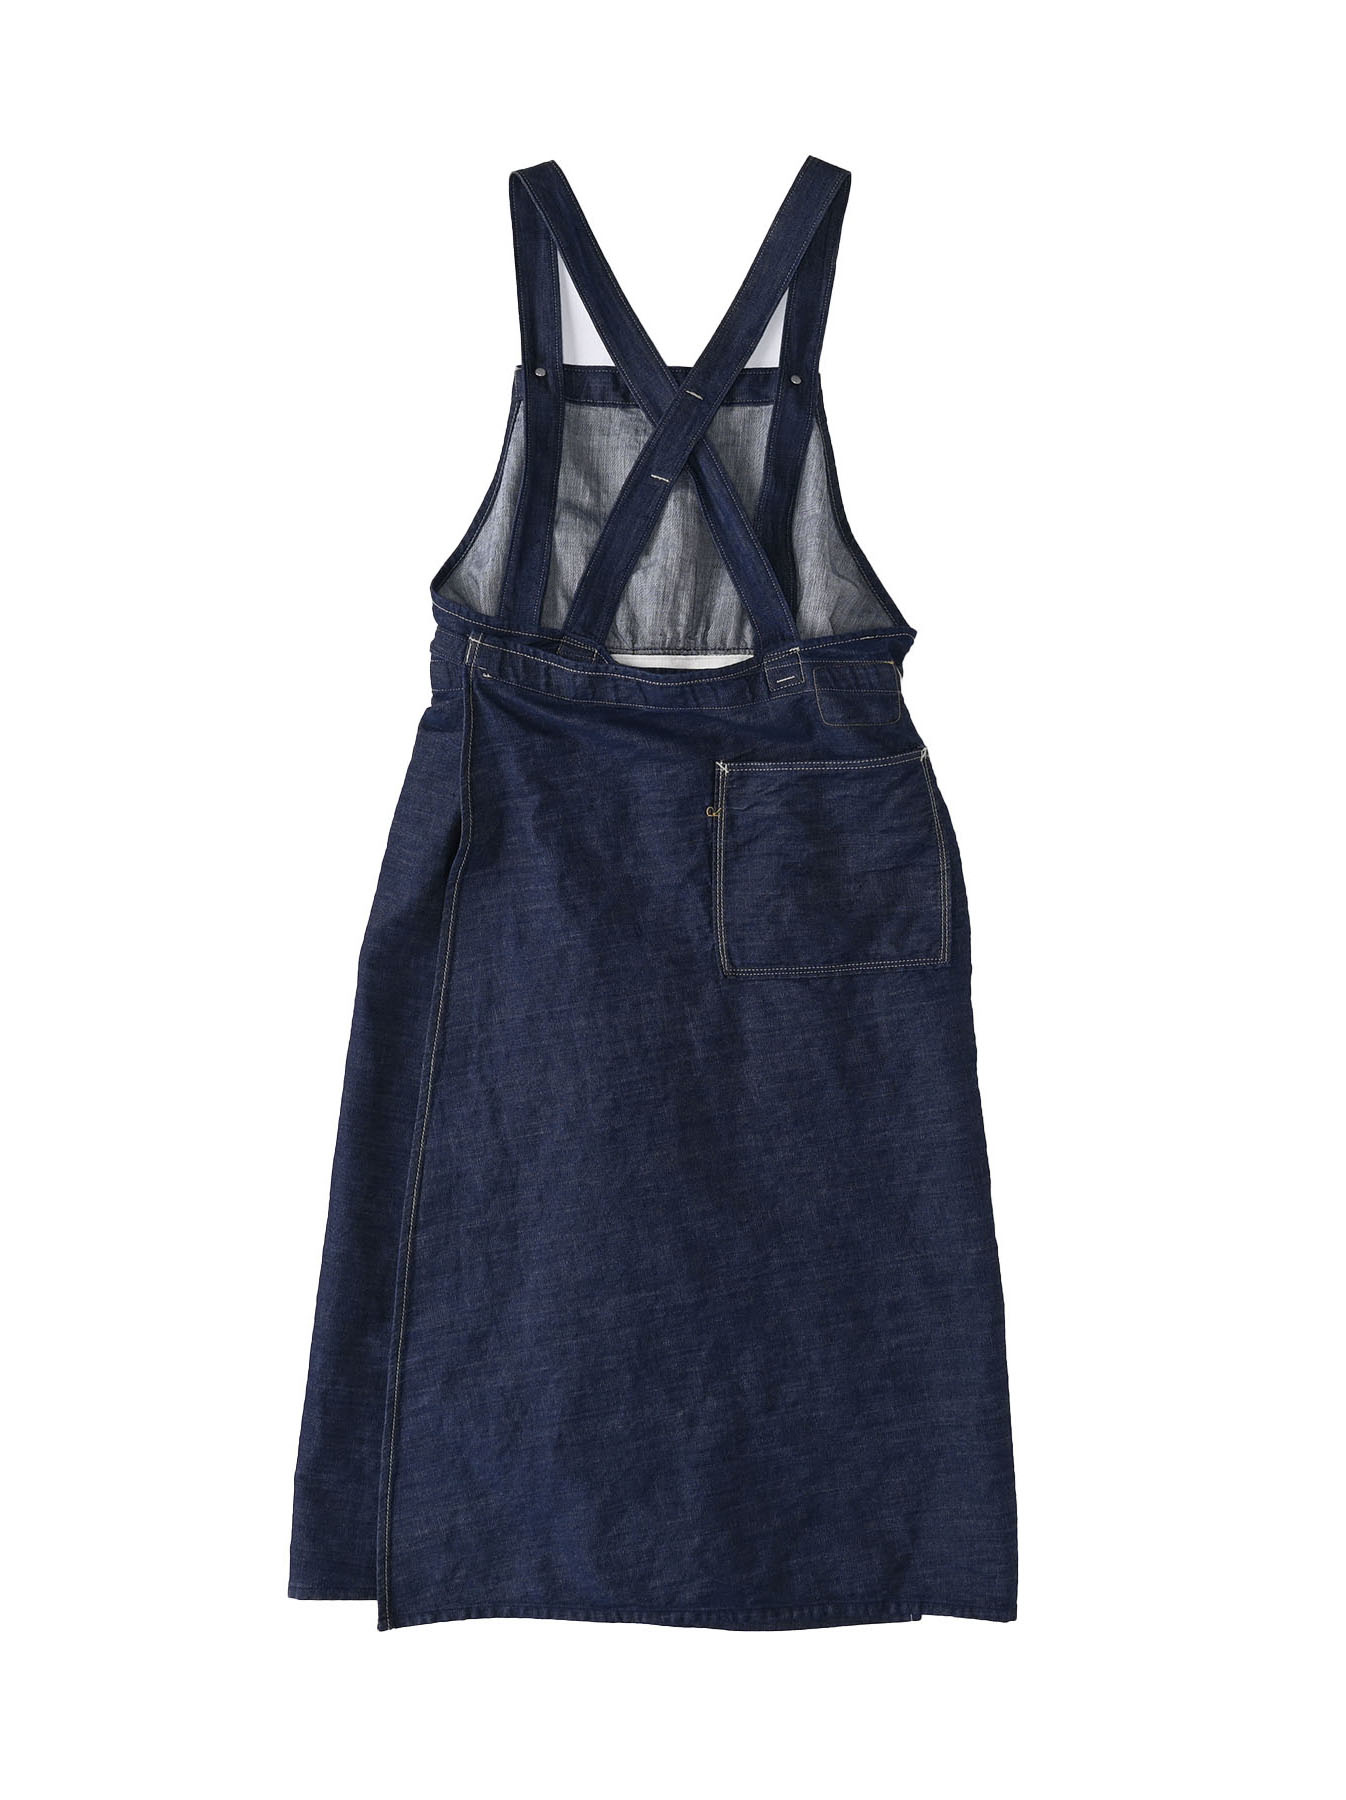 Monpu Apron Dress (0421)-6